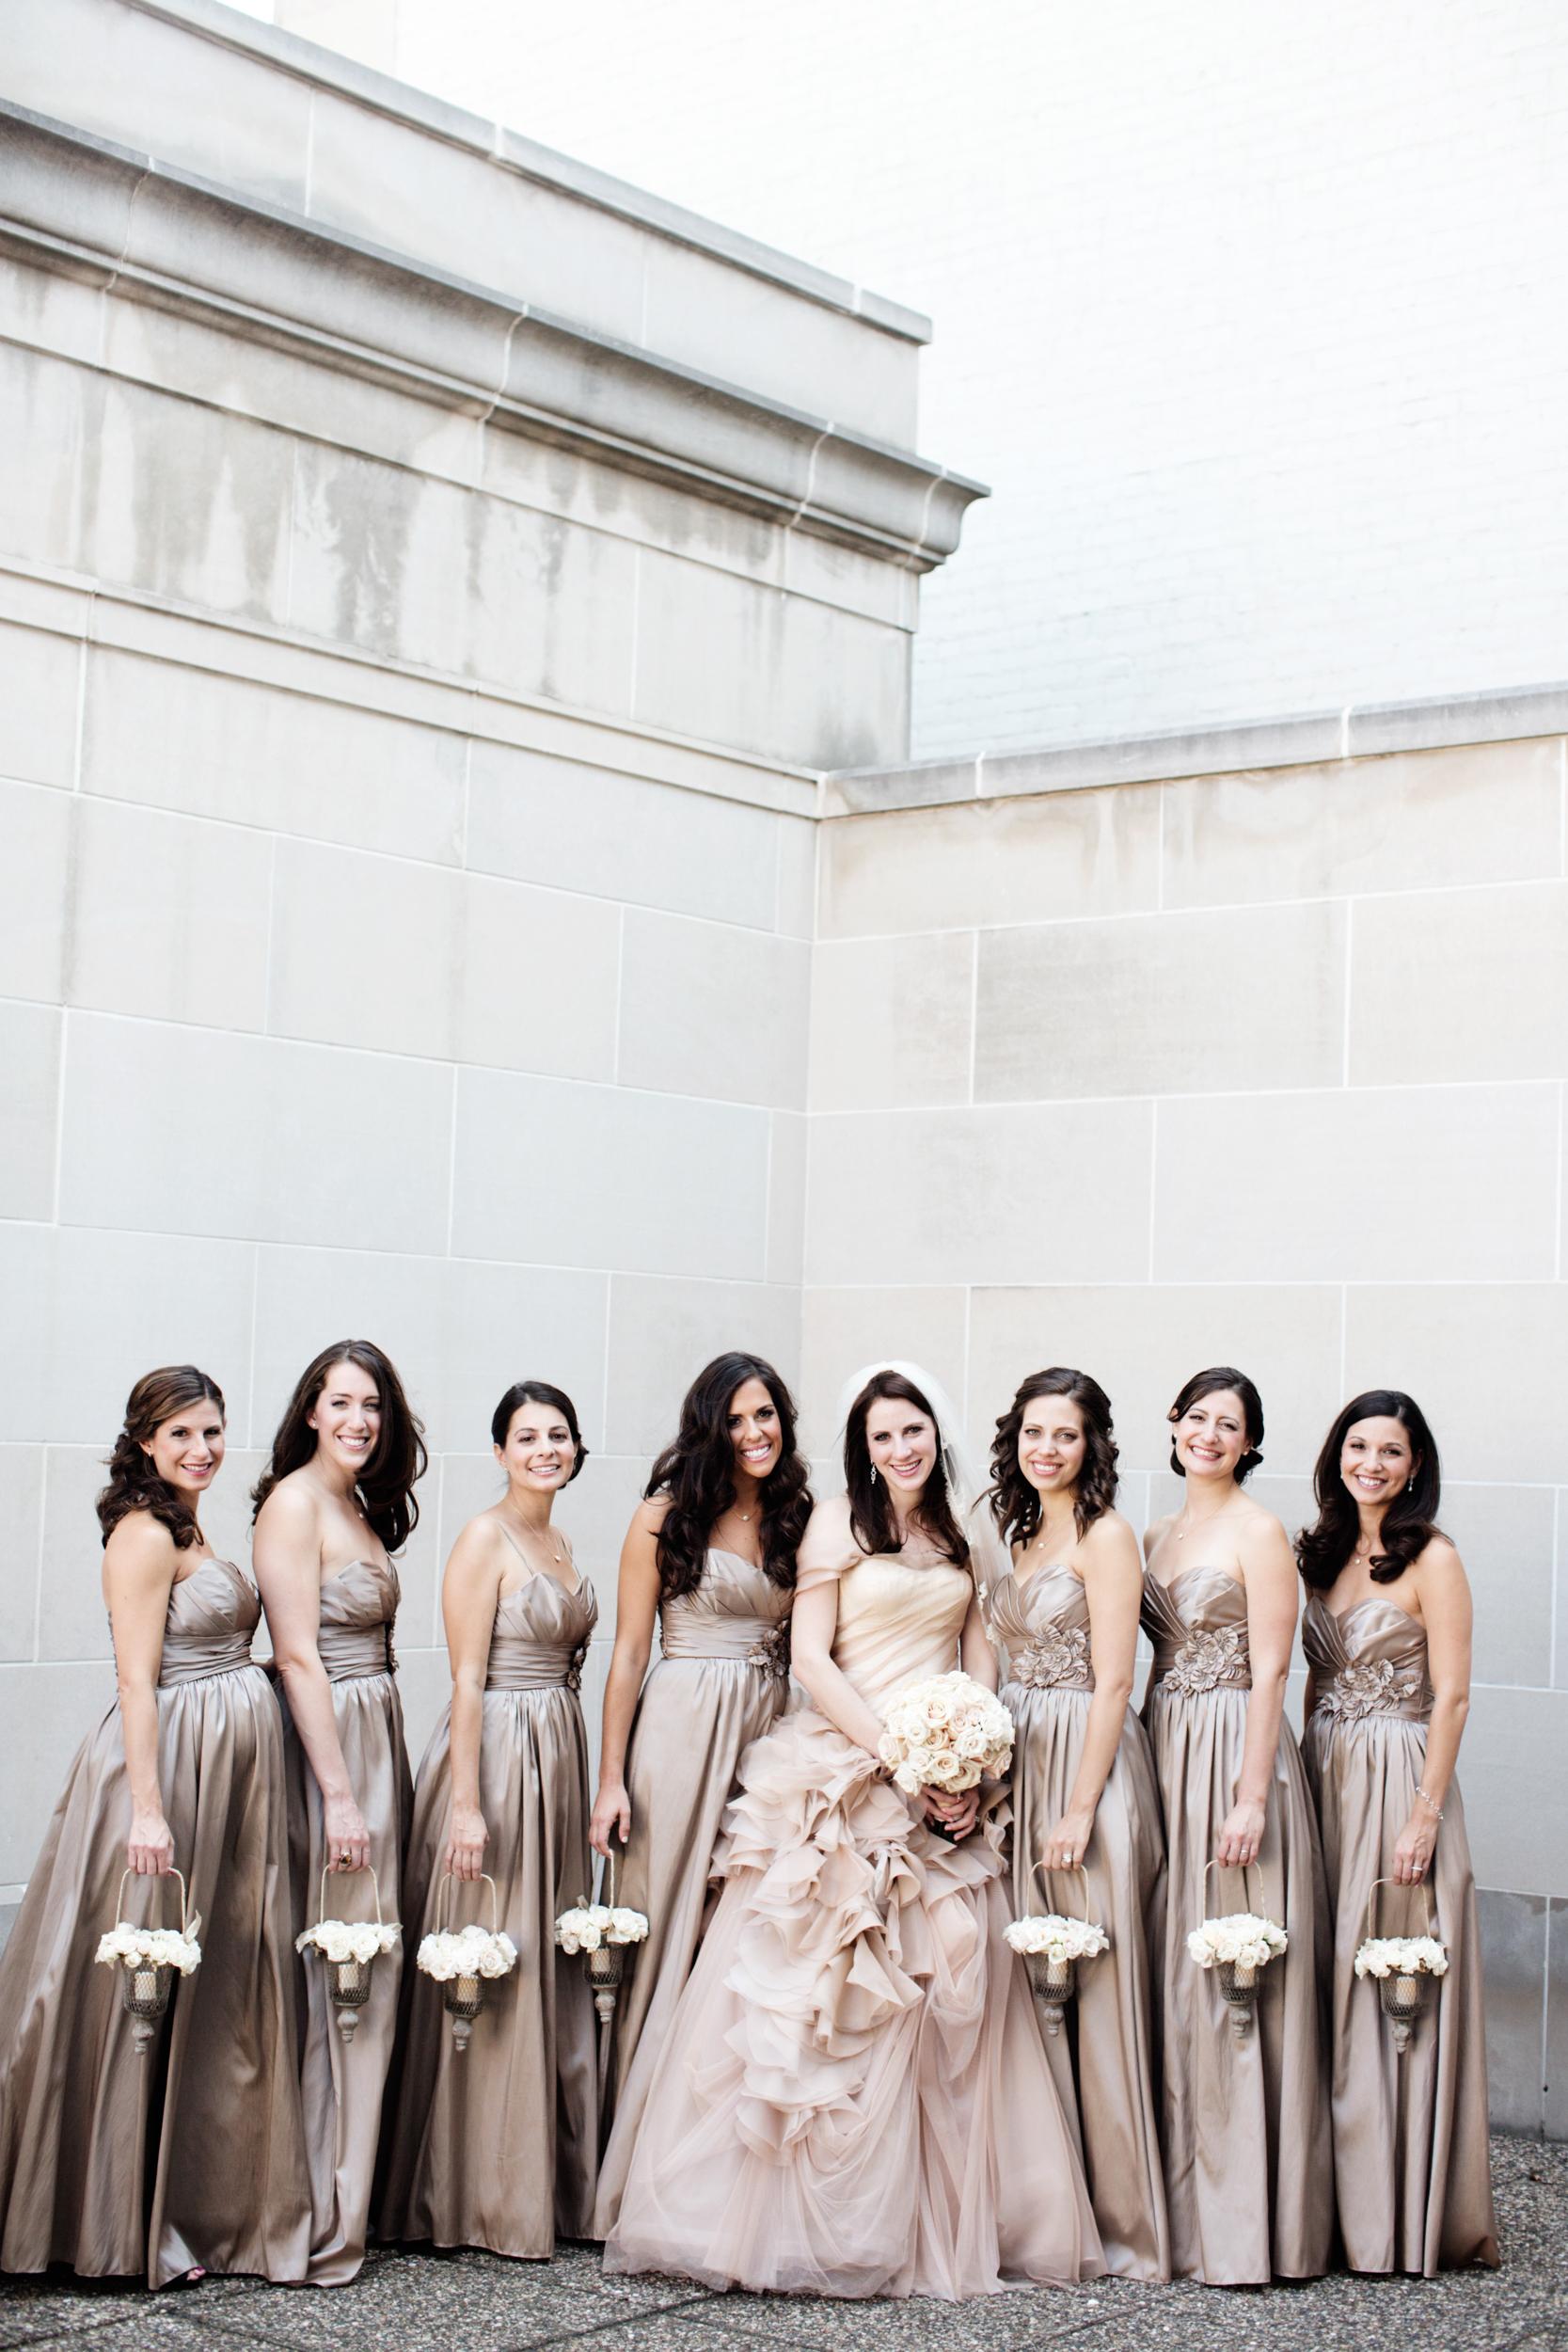 Ceci_New_York_Ceci_Style_Ceci_Johnson_Luxury_Lifestyle_Floral_Lace_Wedding_Letterpress_Inspiration_Design_Custom_Couture_Personalized_Invitations_-45.jpg